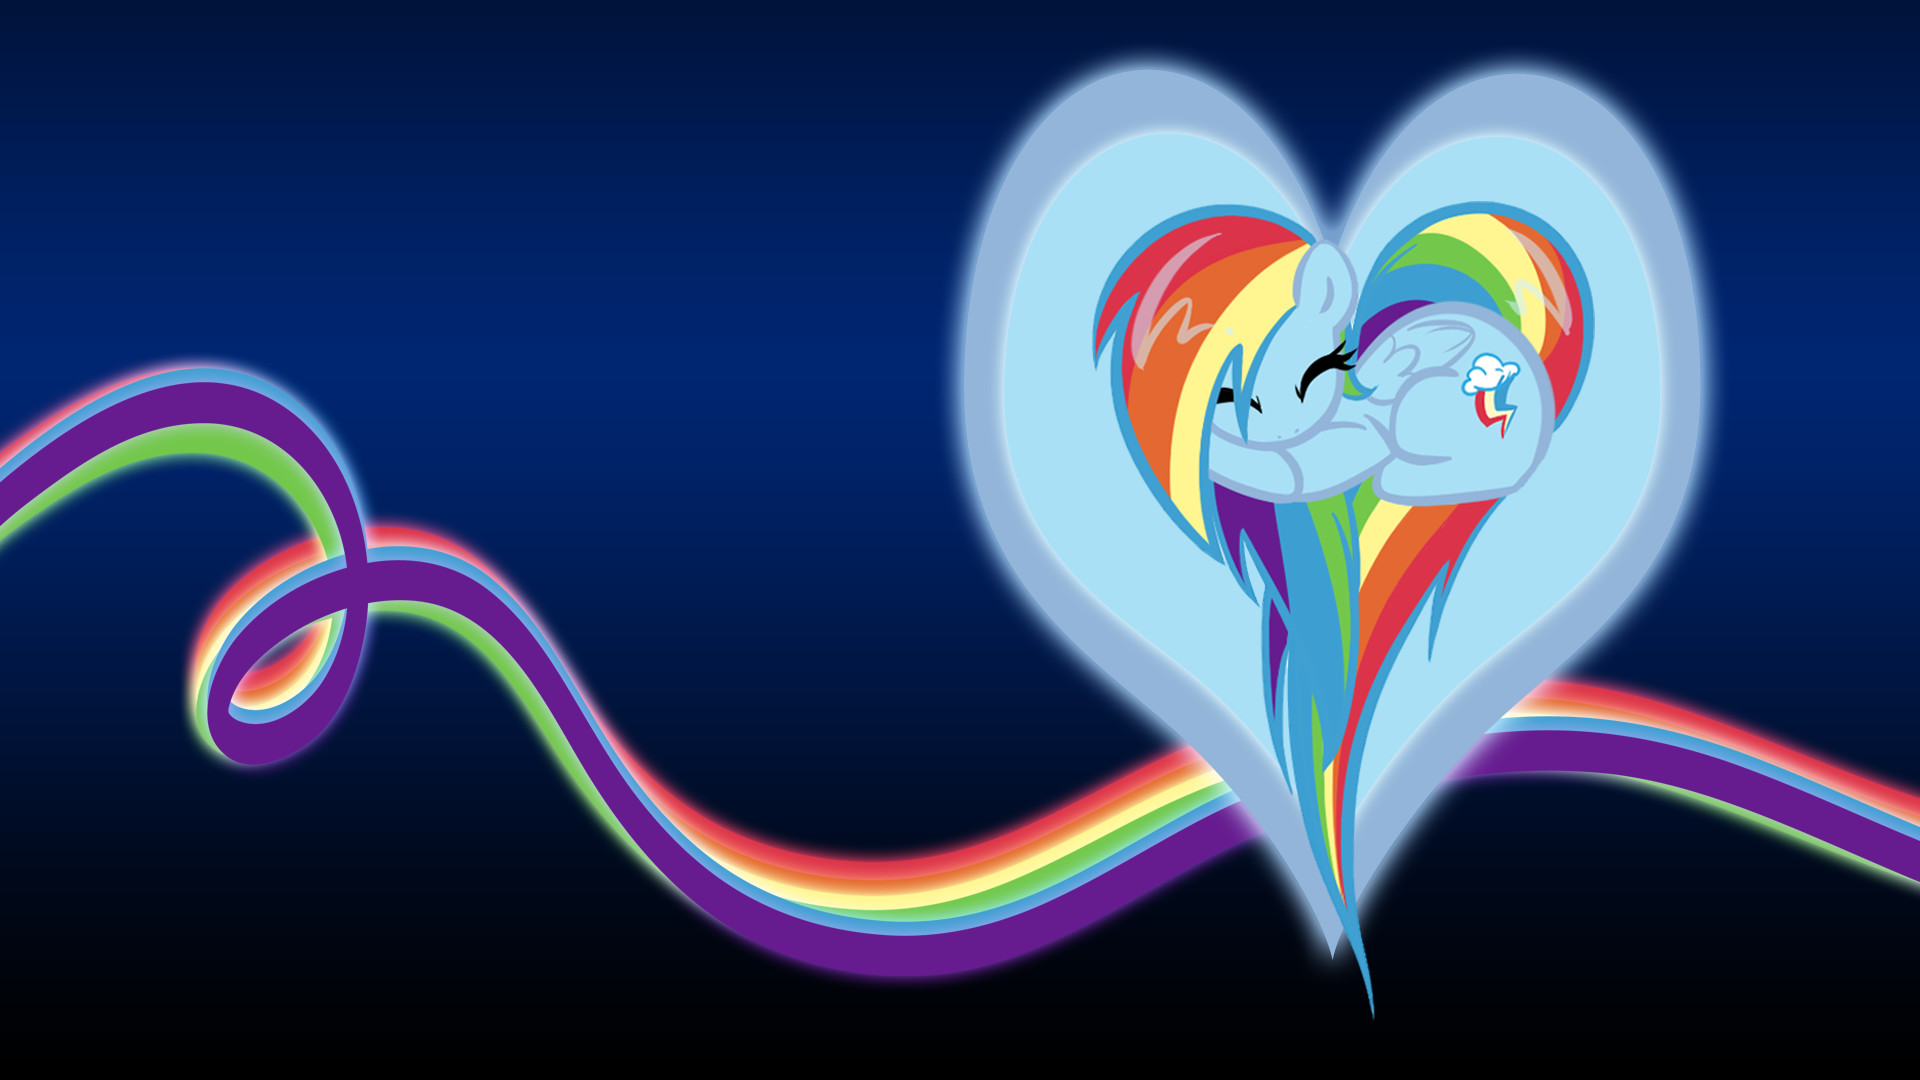 my little pony wallpaper 5405